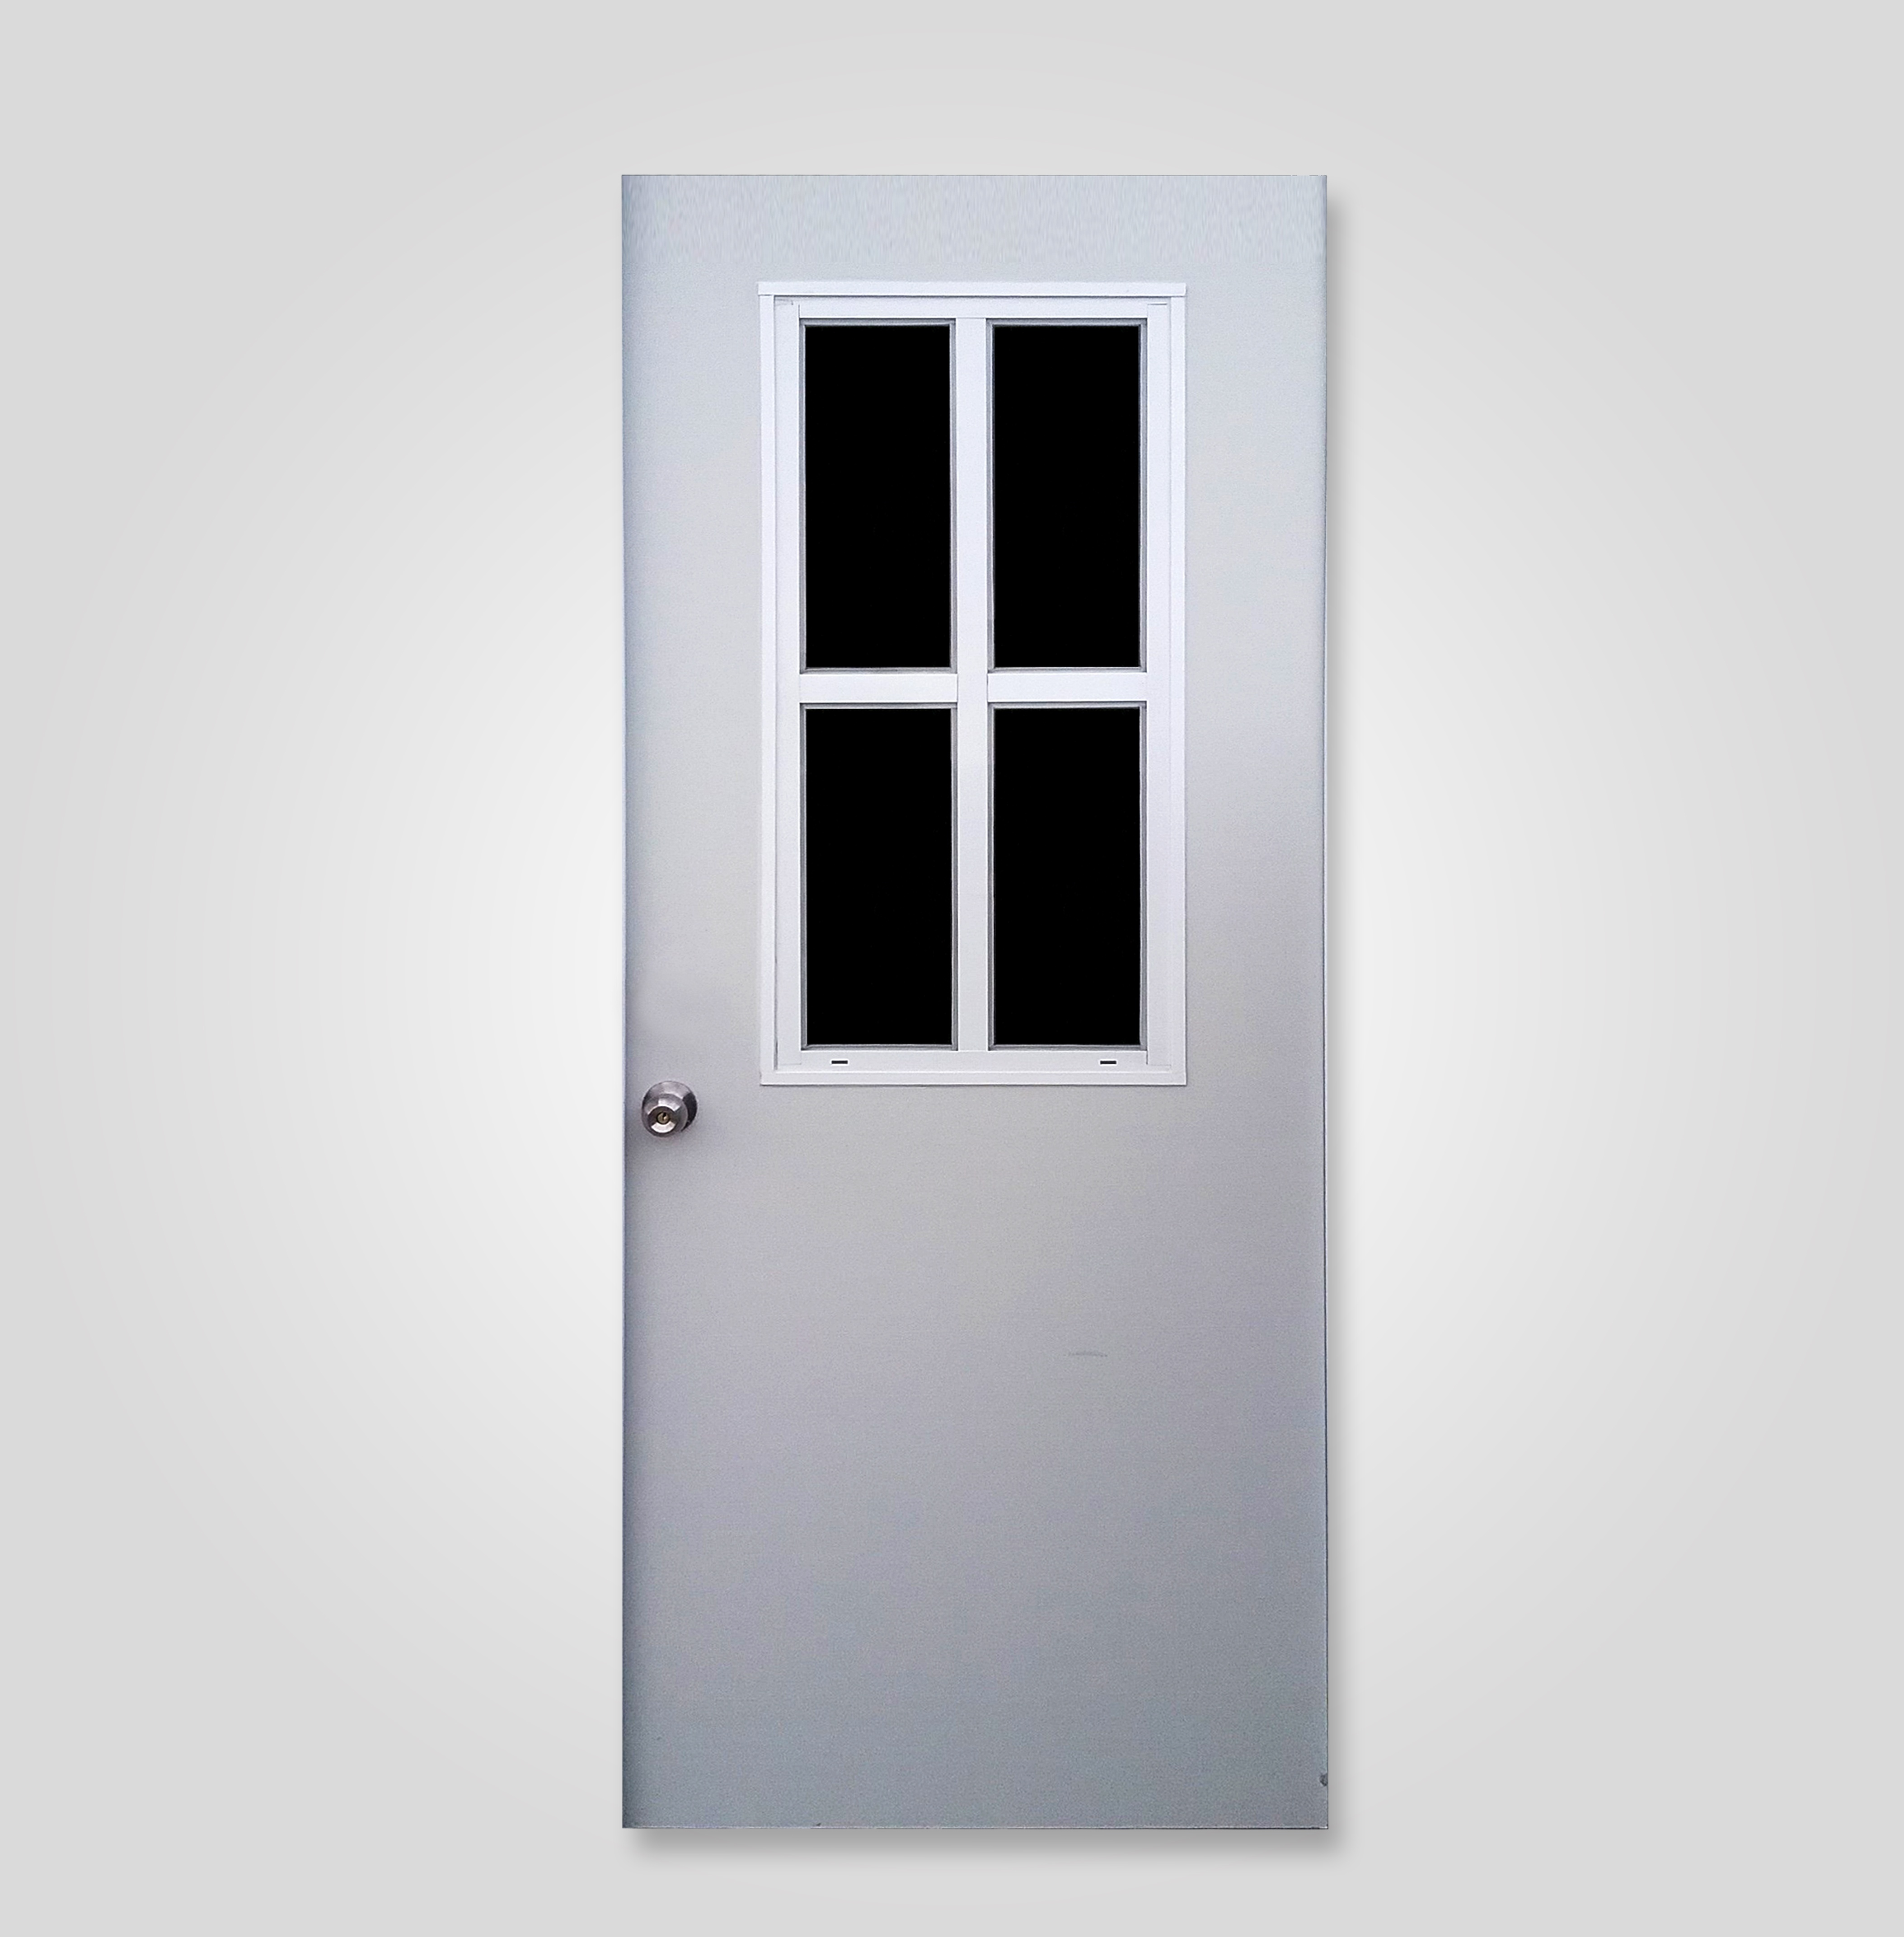 https://0201.nccdn.net/1_2/000/000/18b/fb7/puerta-metalica-5-4214x4288.jpg